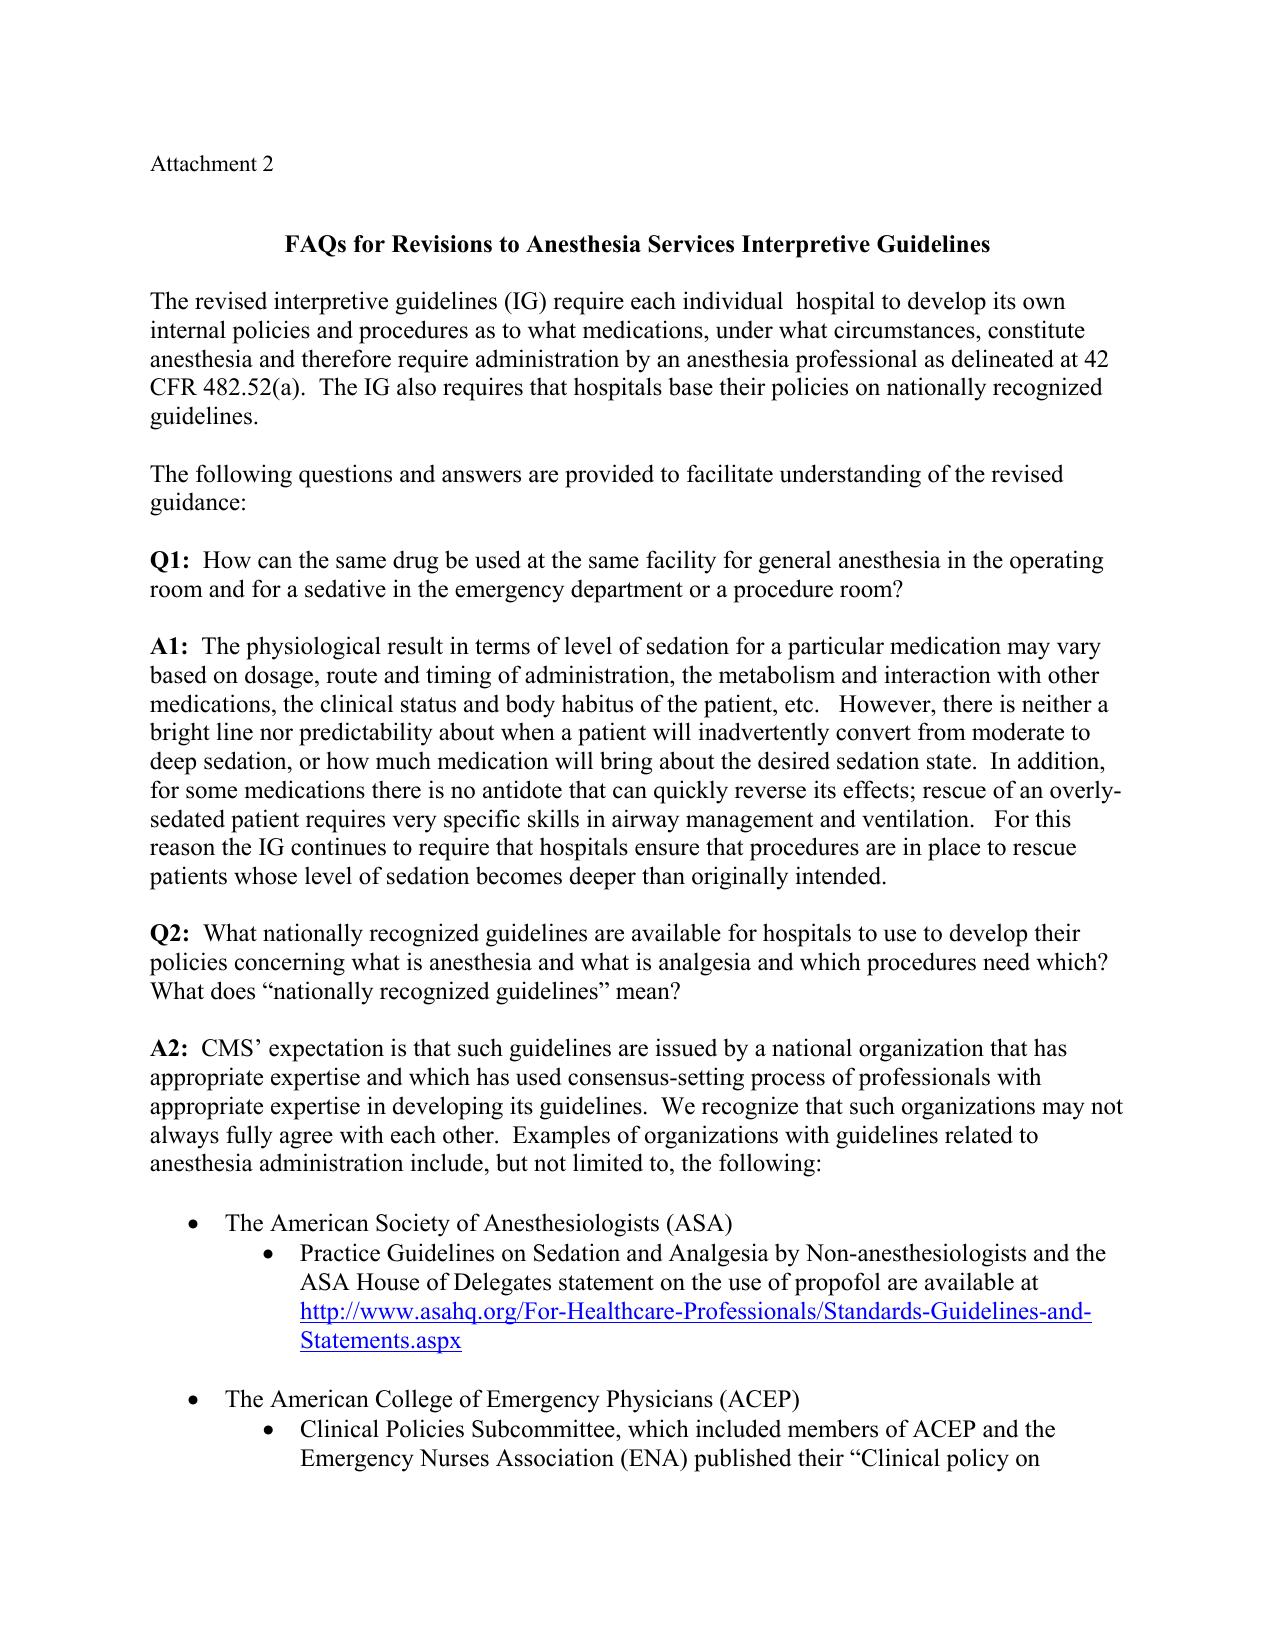 2011 FAQ for CMS Revised Hospital Interpretive Guidelines